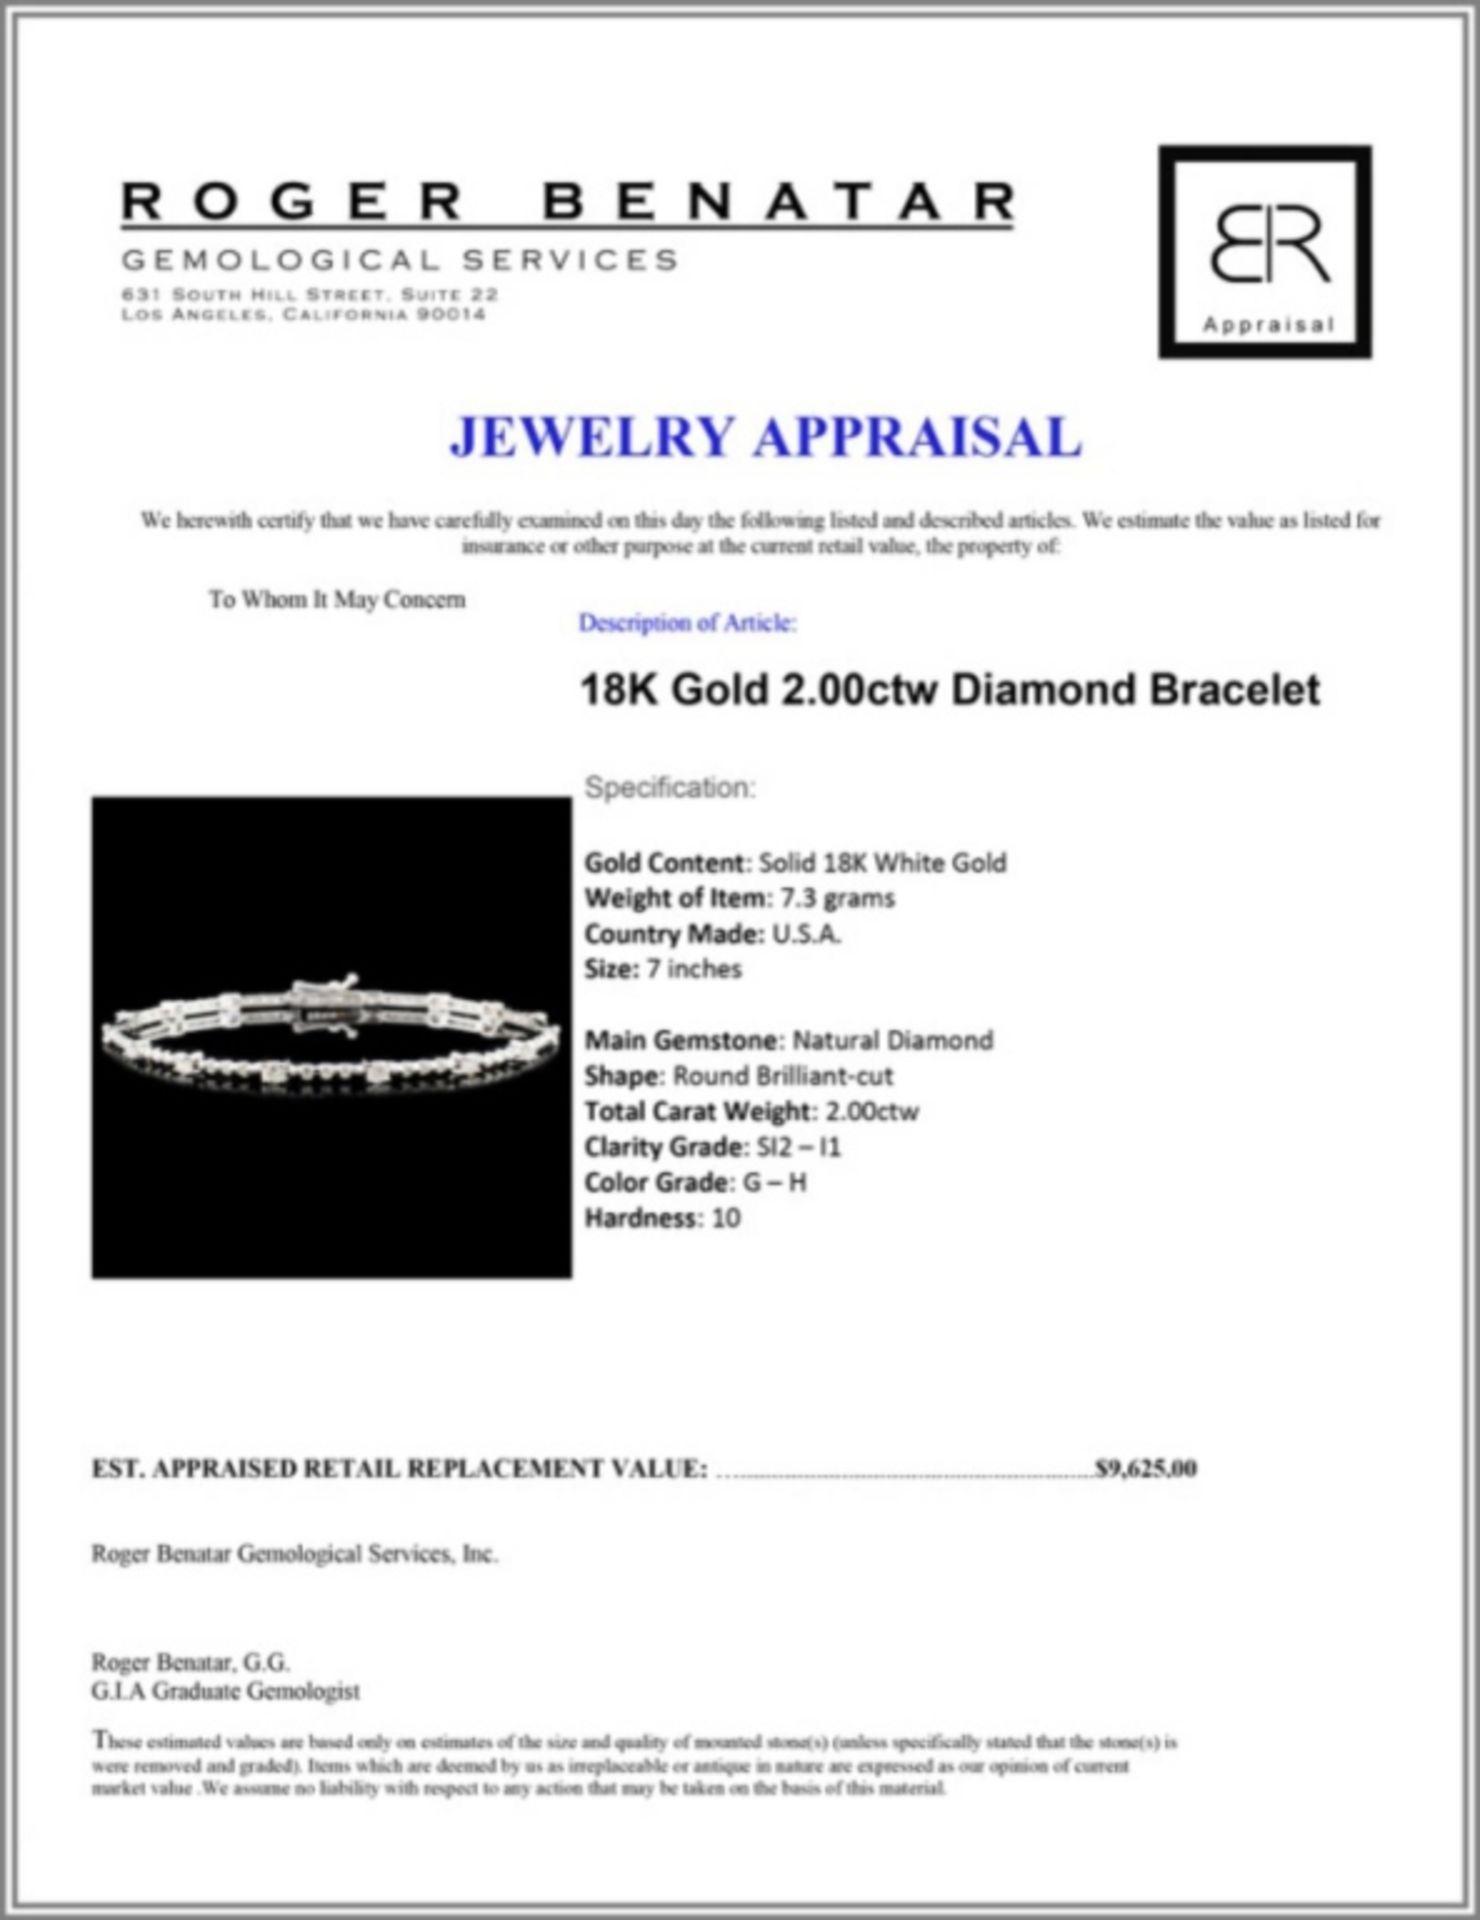 18K Gold 2.00ctw Diamond Bracelet - Image 3 of 3